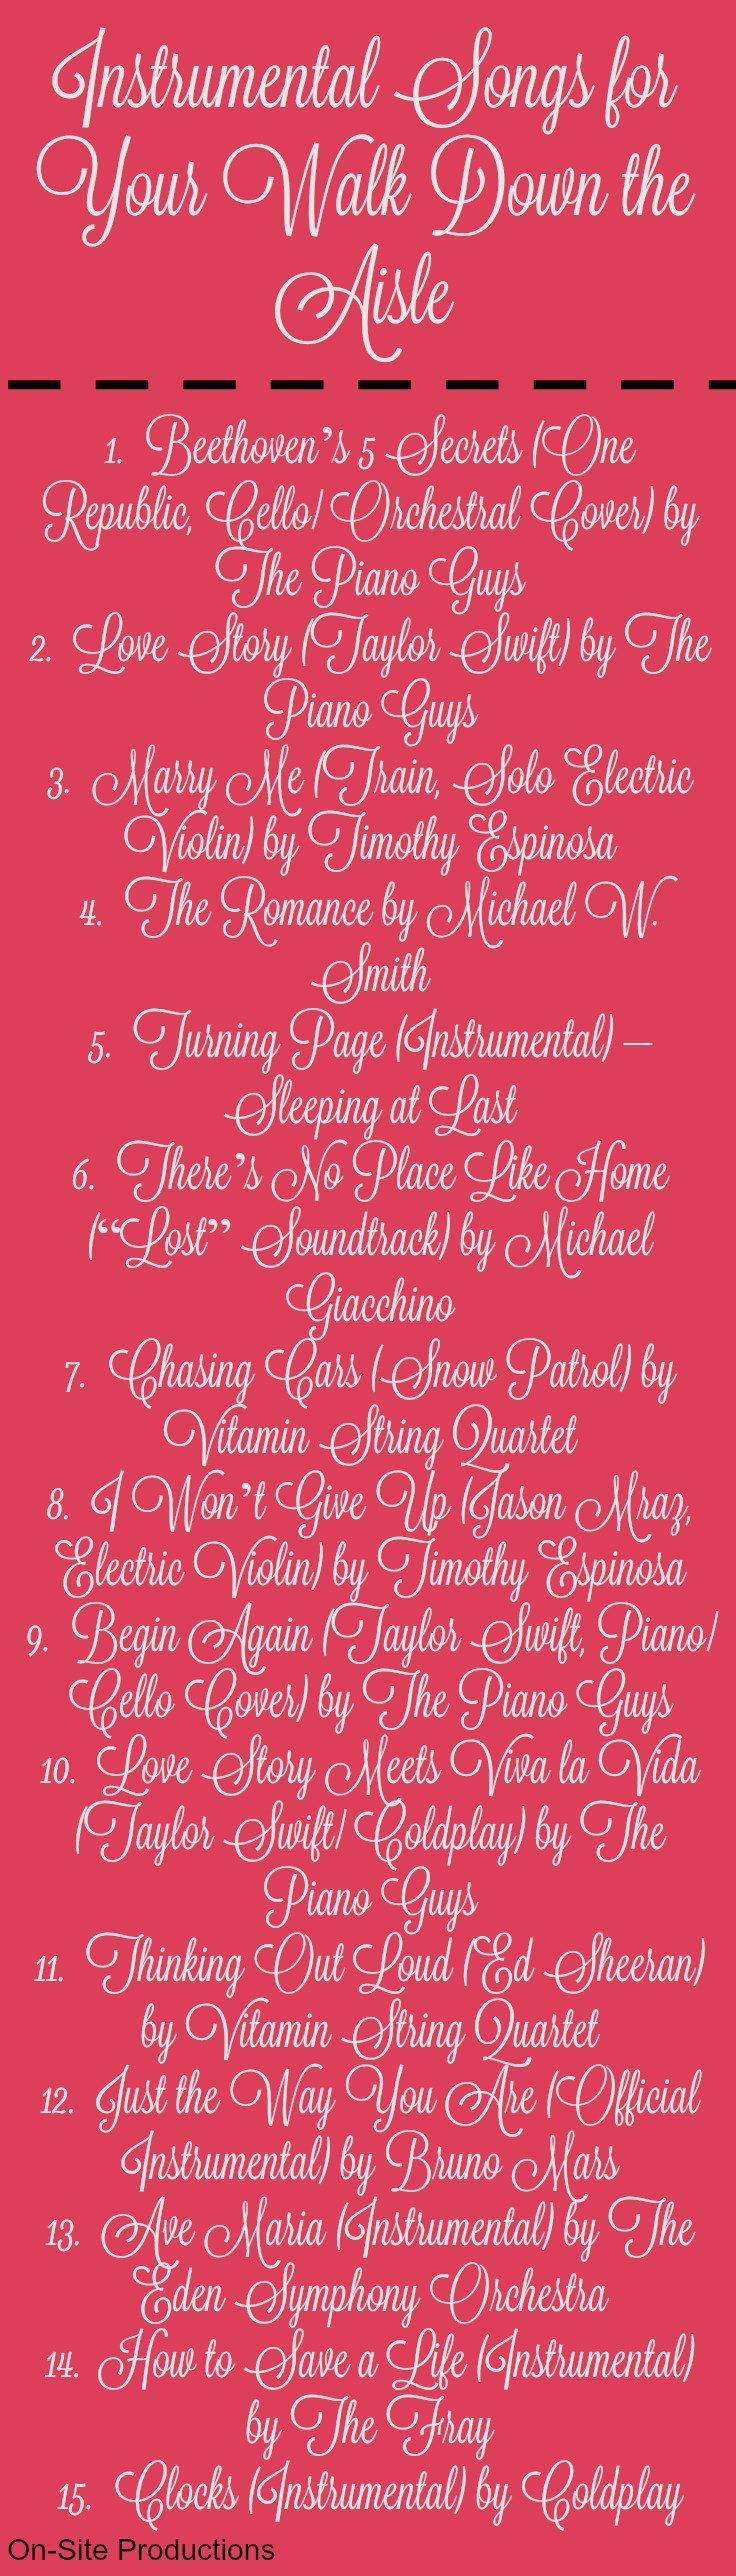 best wedding ideas images on pinterest bridesmaid proposal